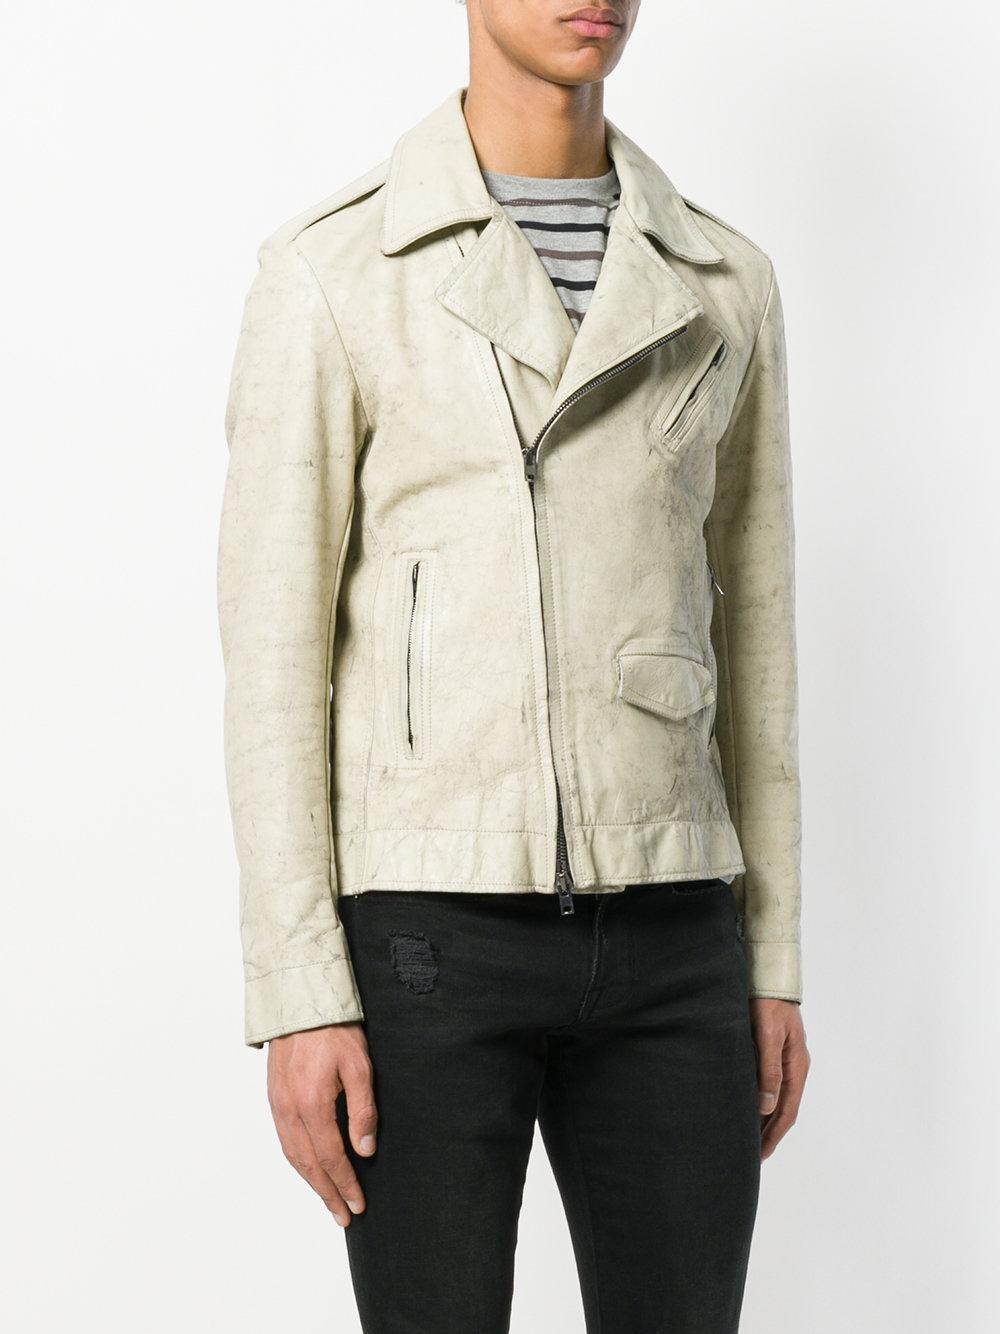 Salvatore Santoro Leather Marble Effect Biker Jacket in White for Men